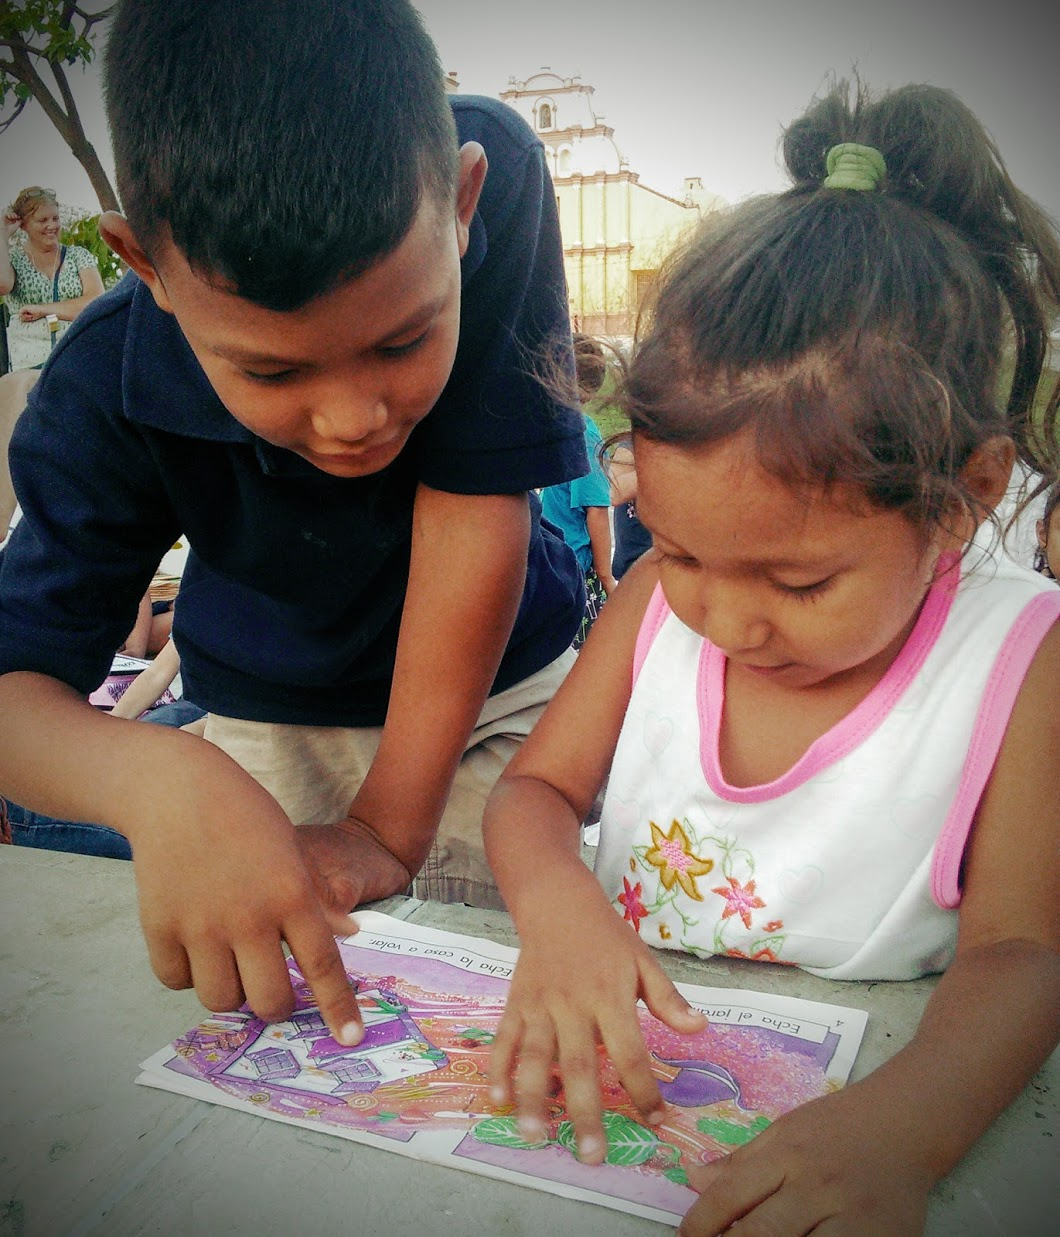 Brother & Sister Viva León Leyendo